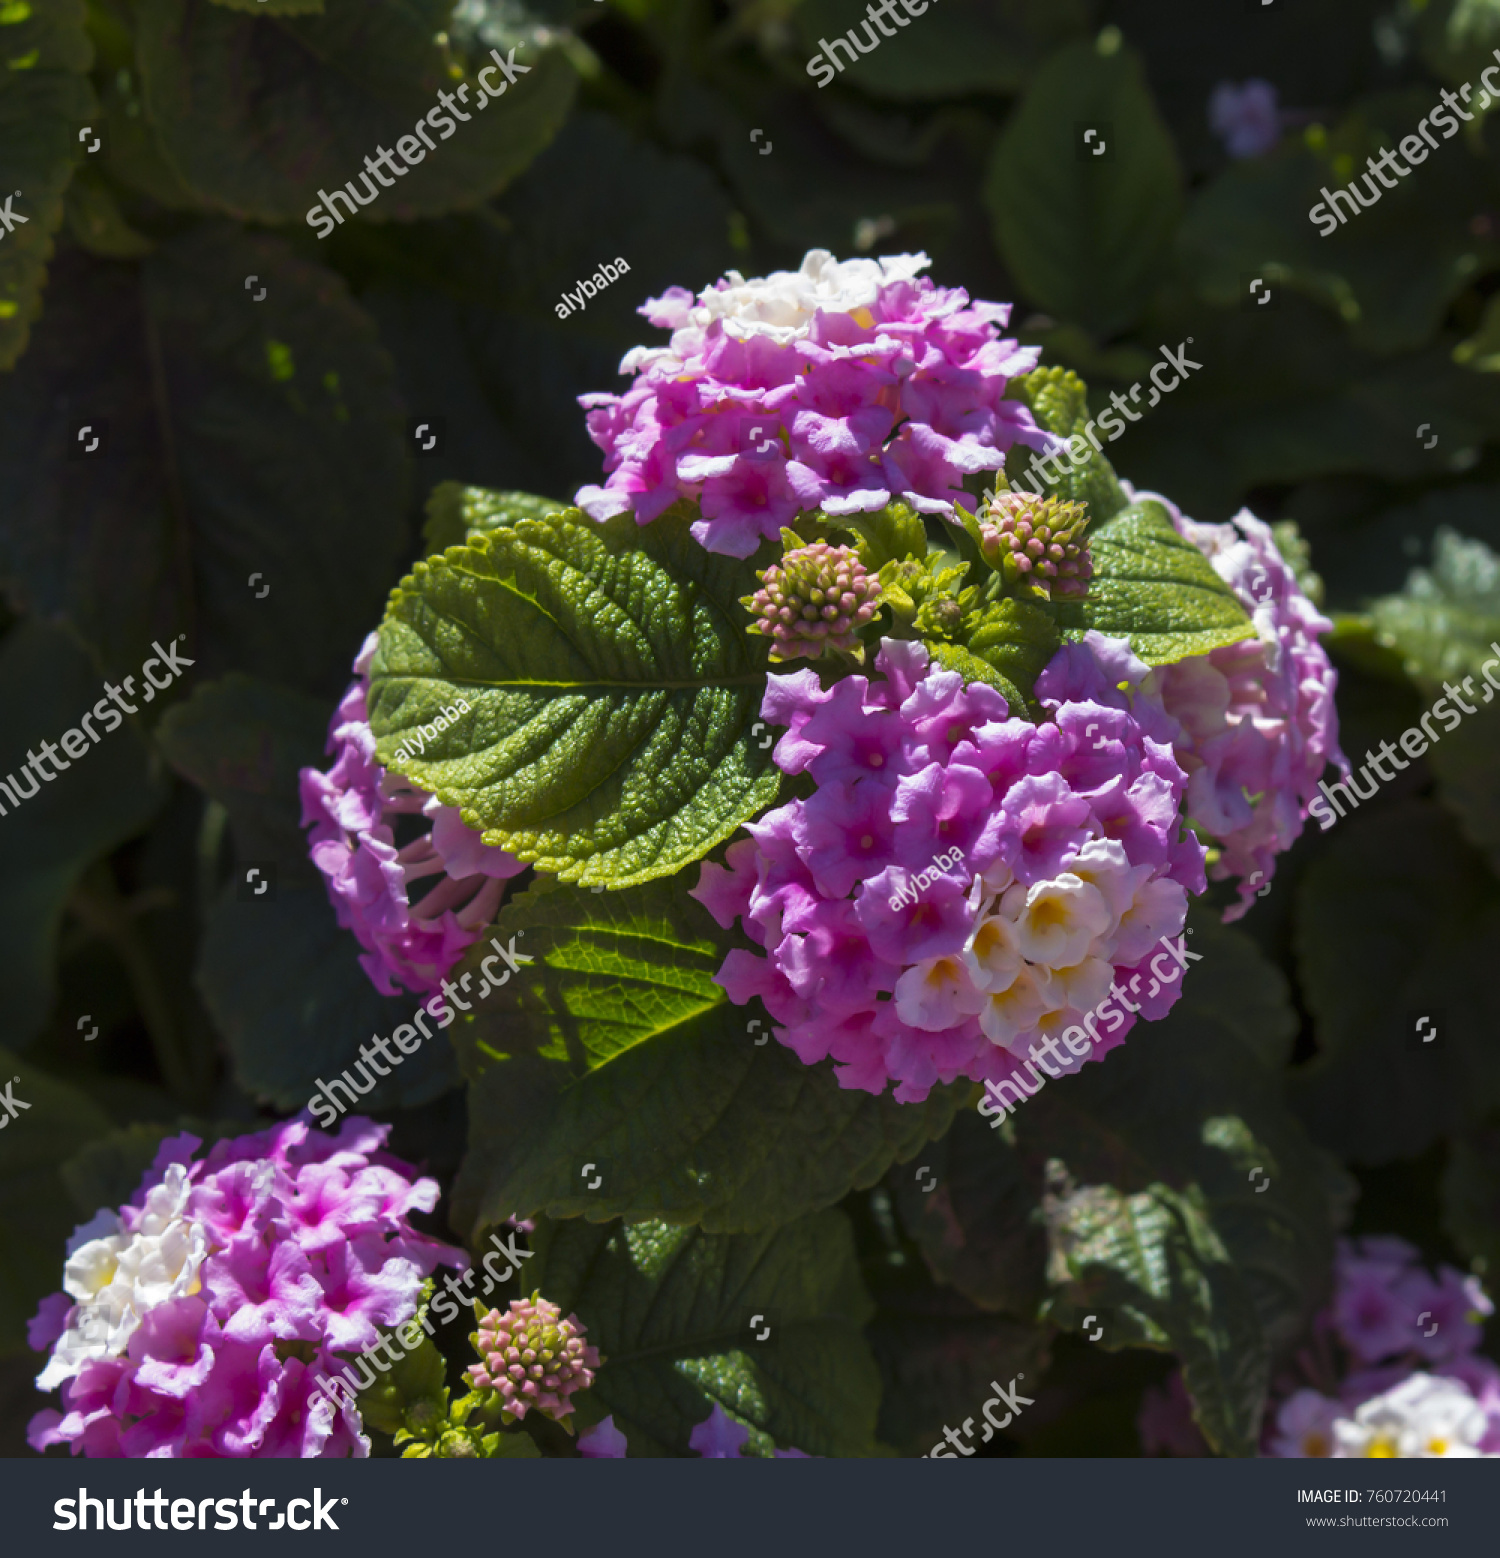 White Aromatic Flower Images Flower Decoration Ideas